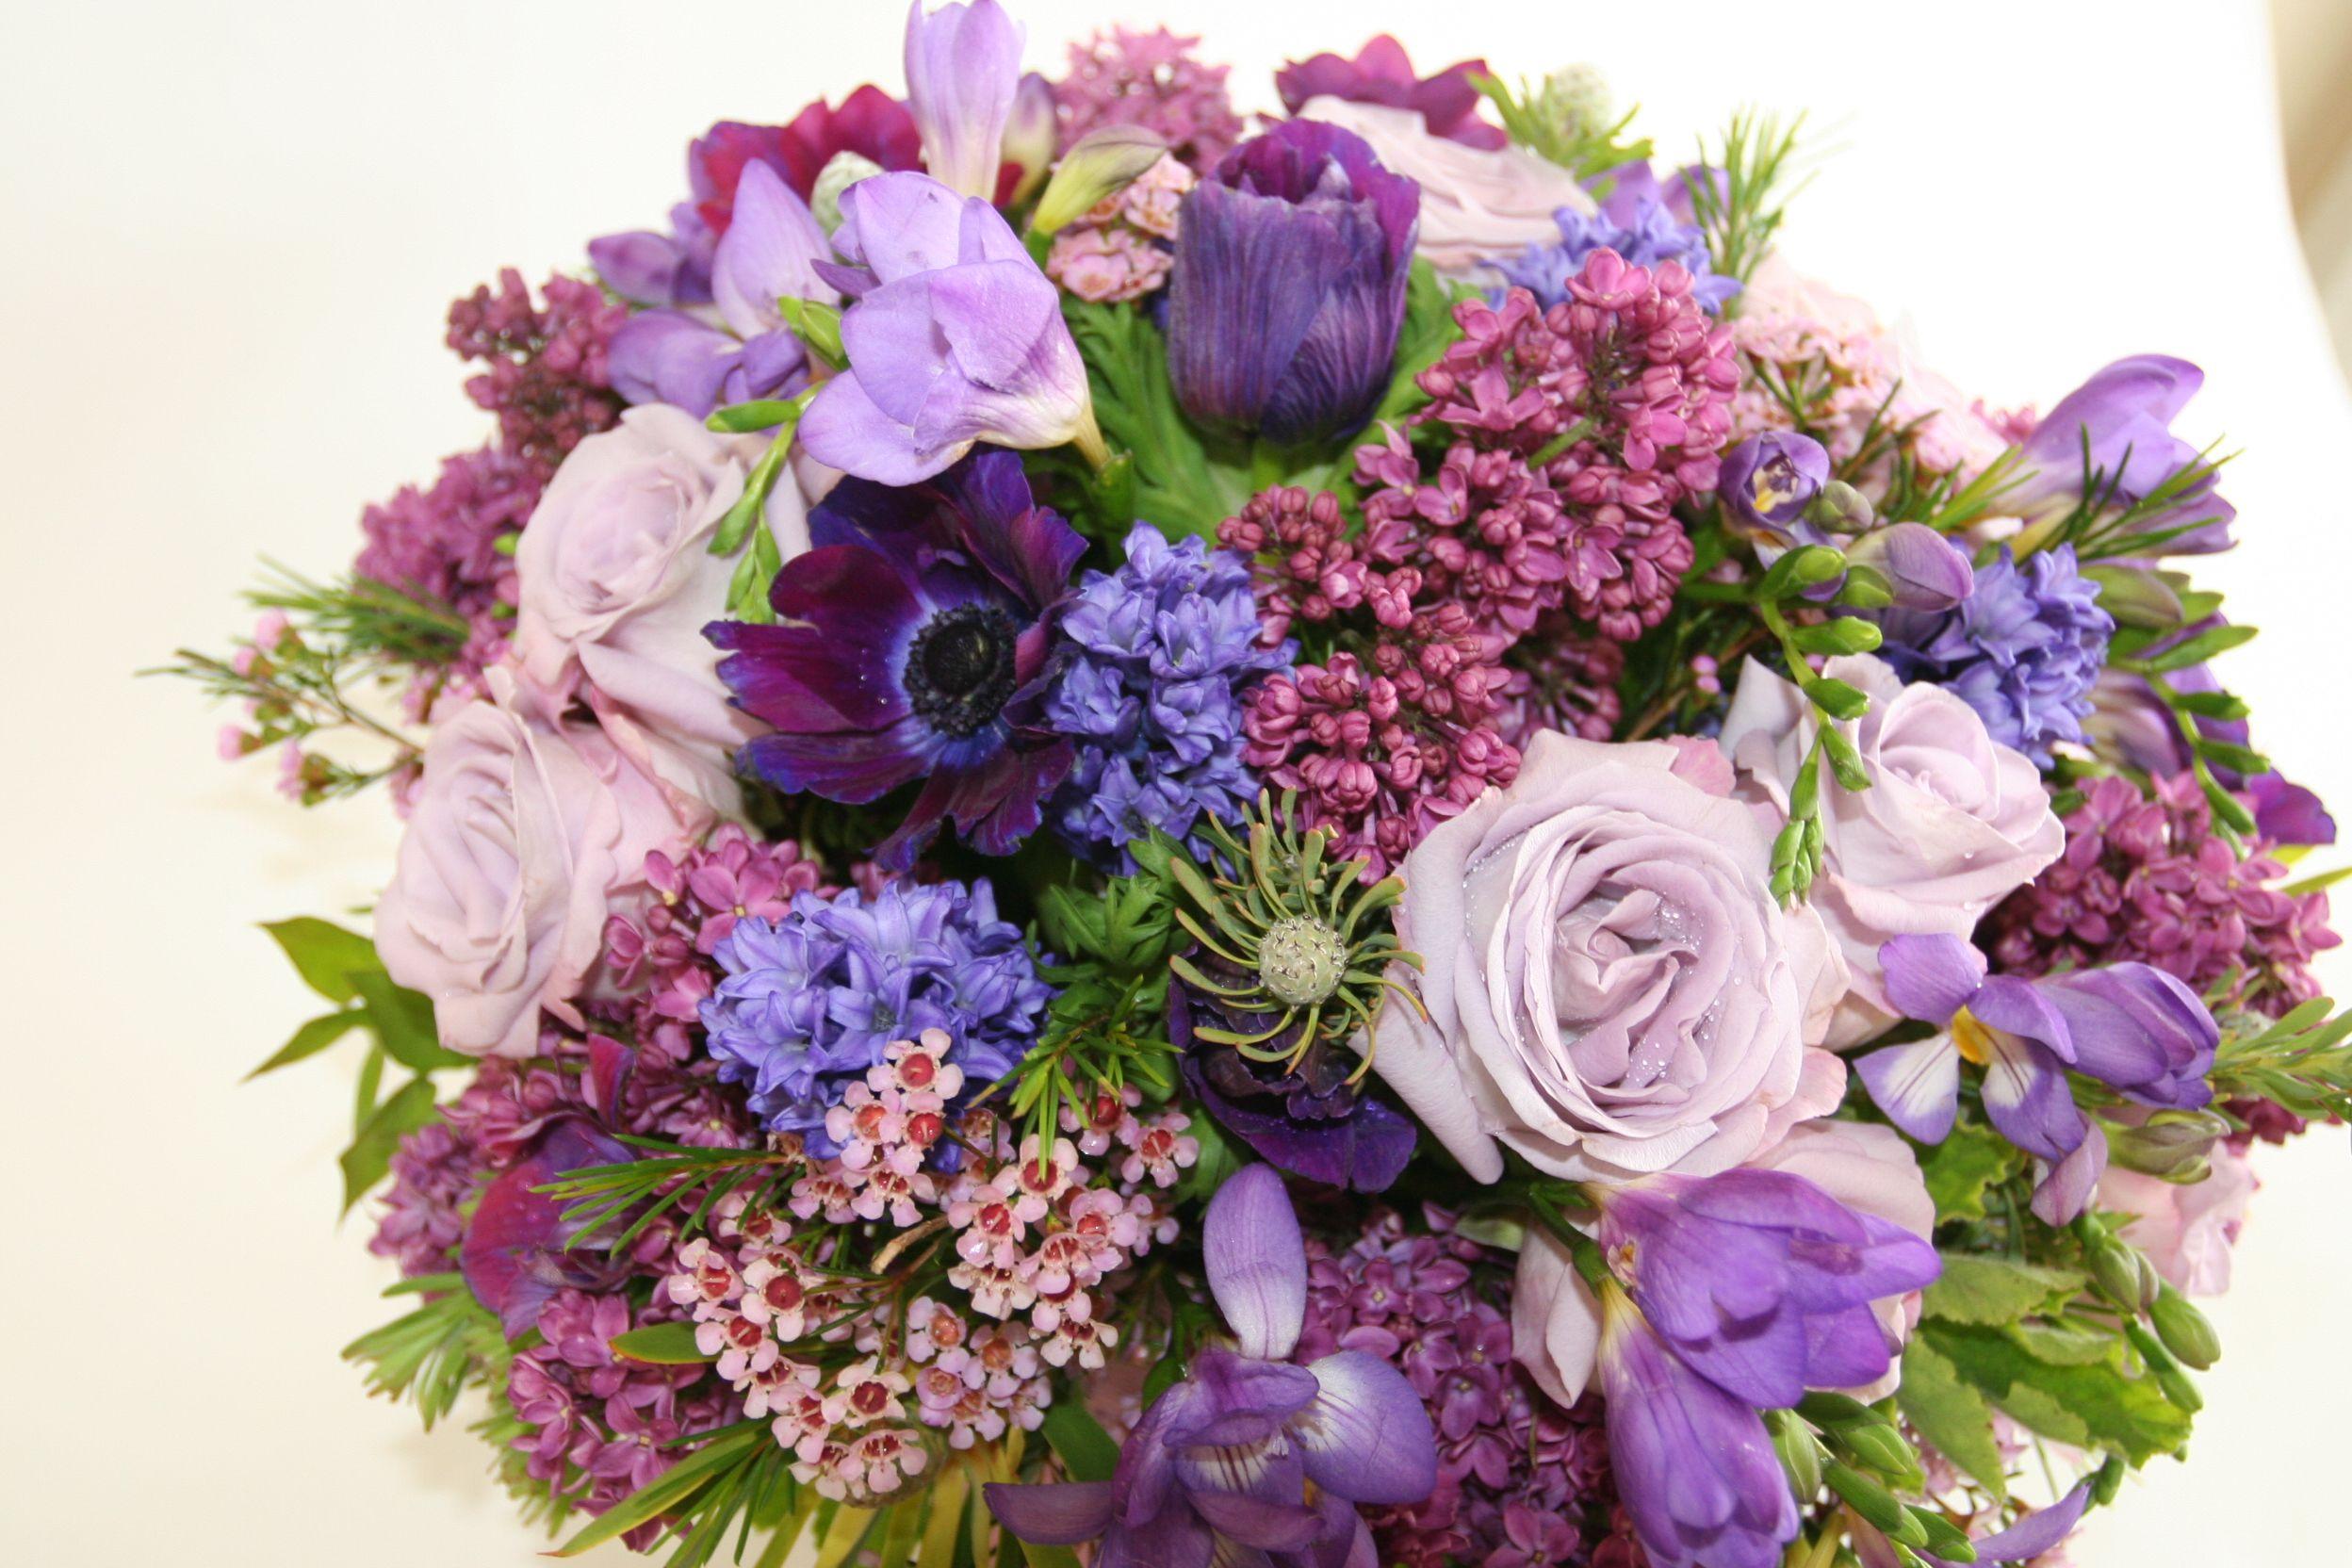 Anemones lilacs hyacinth roses freesia waxflower